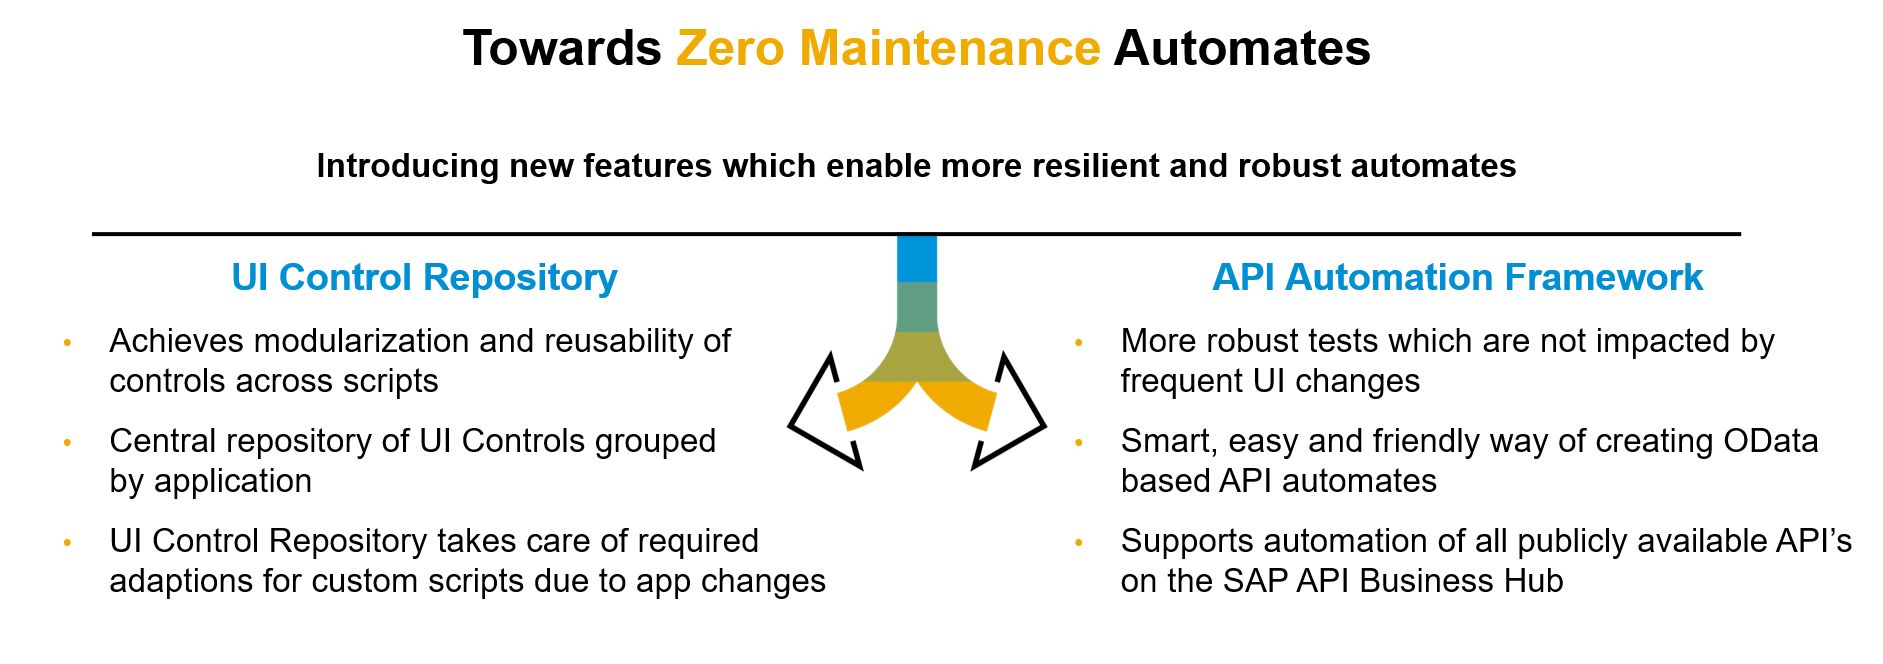 Towards%20Zero%20Maintenance%20Scripts